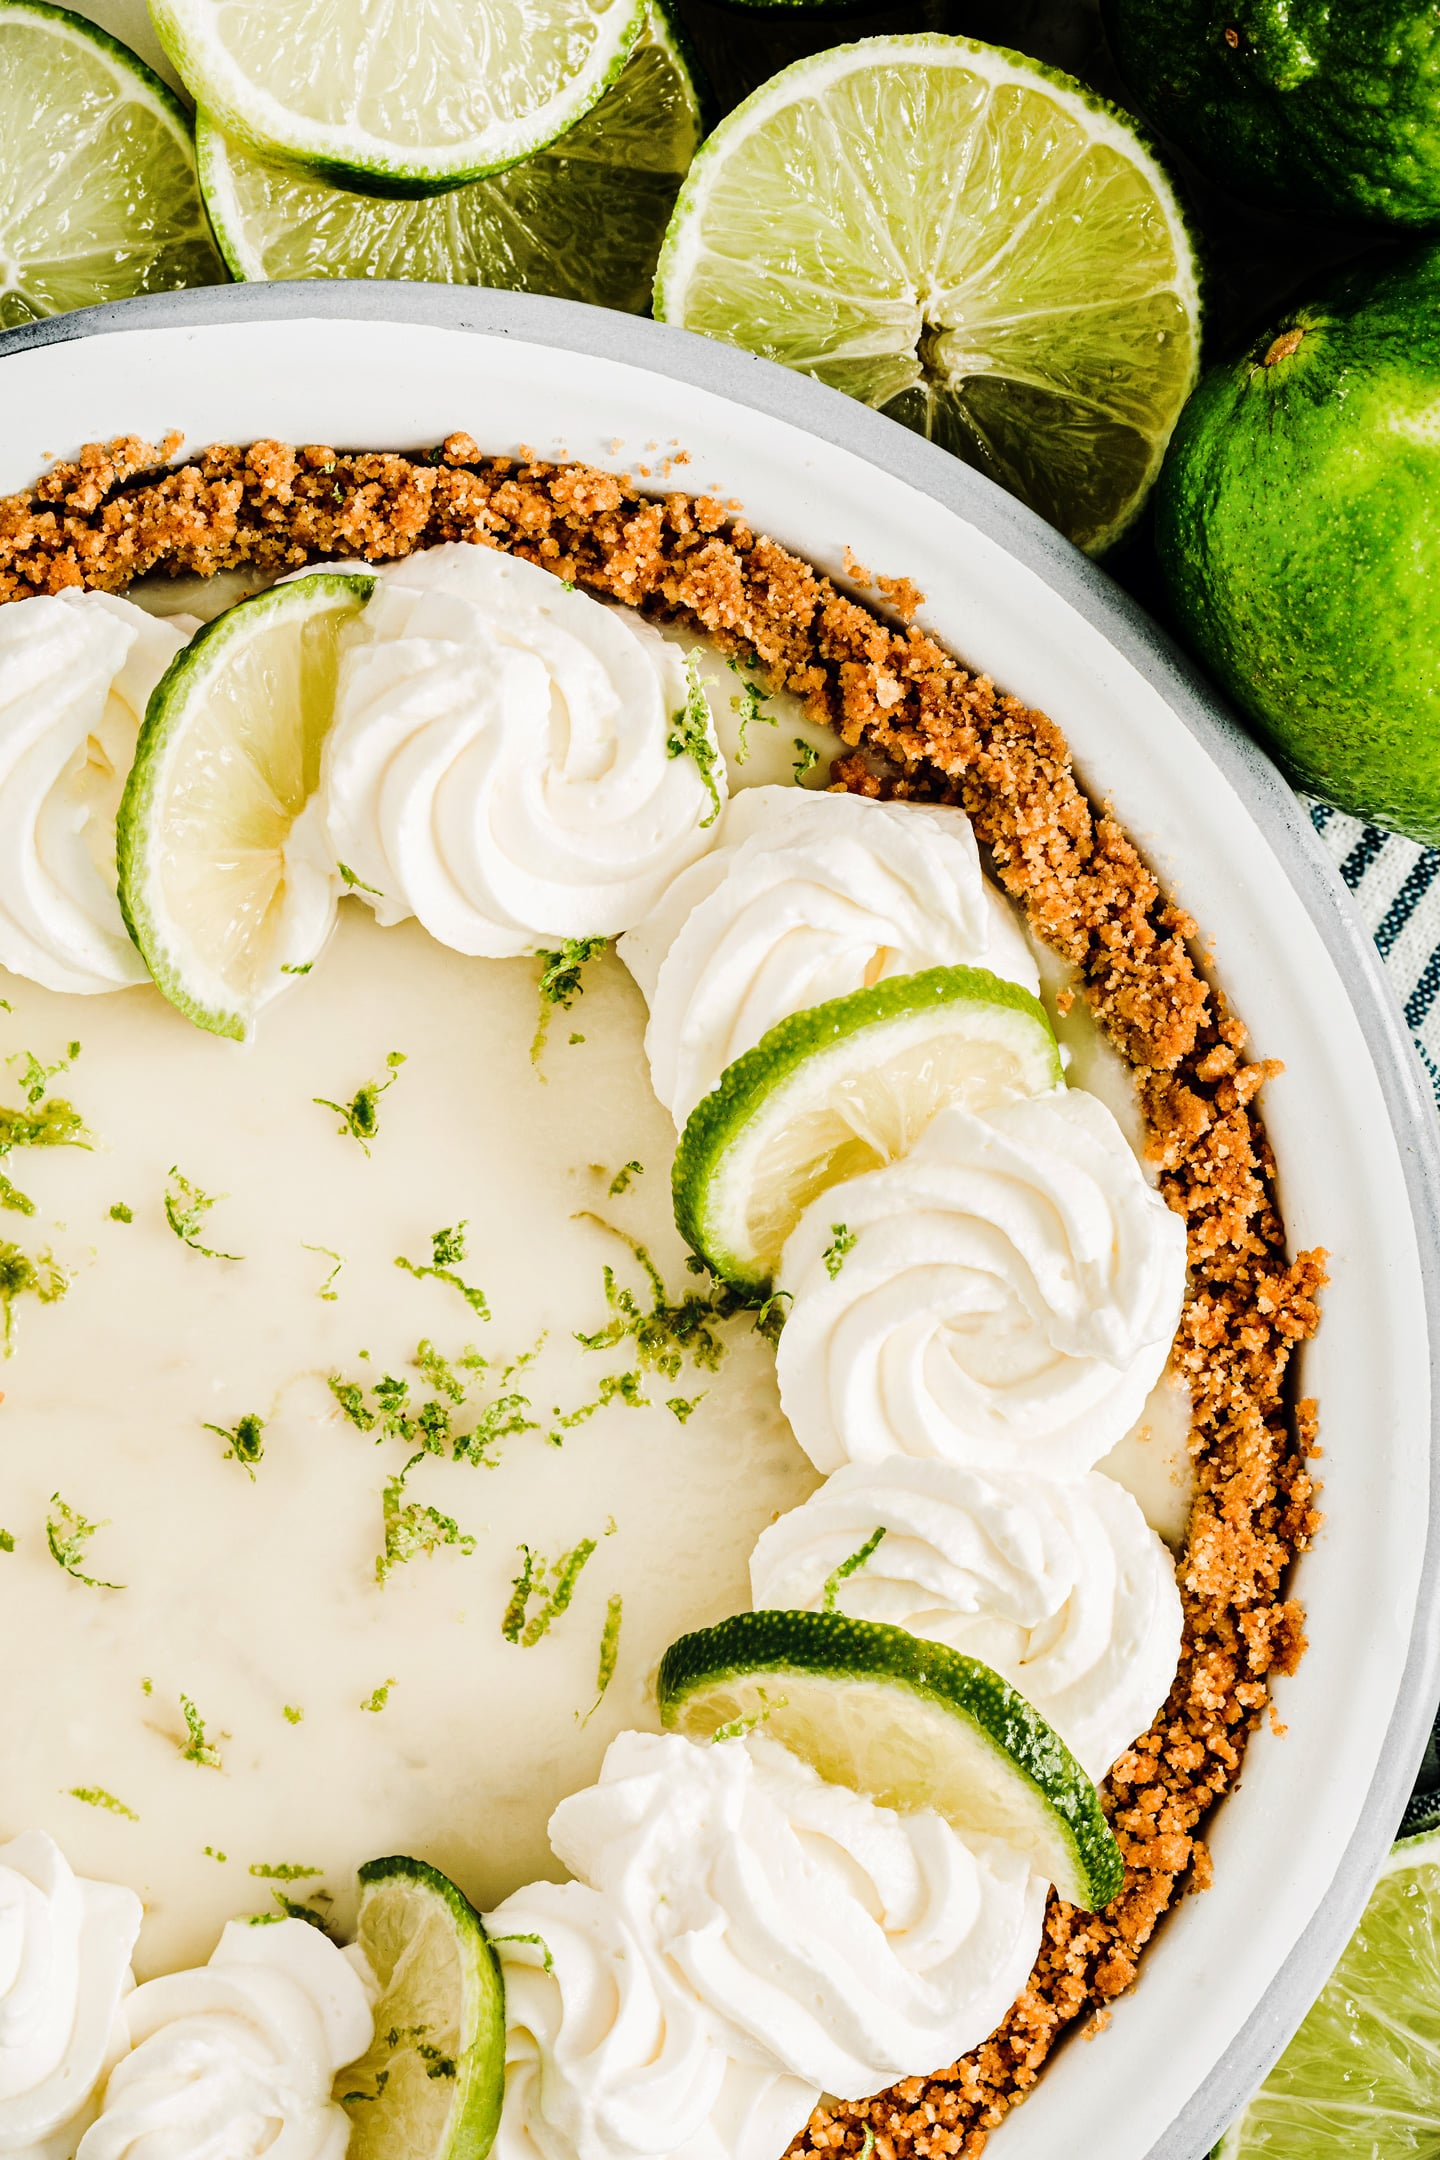 Key lime pie la tarte au citron vert